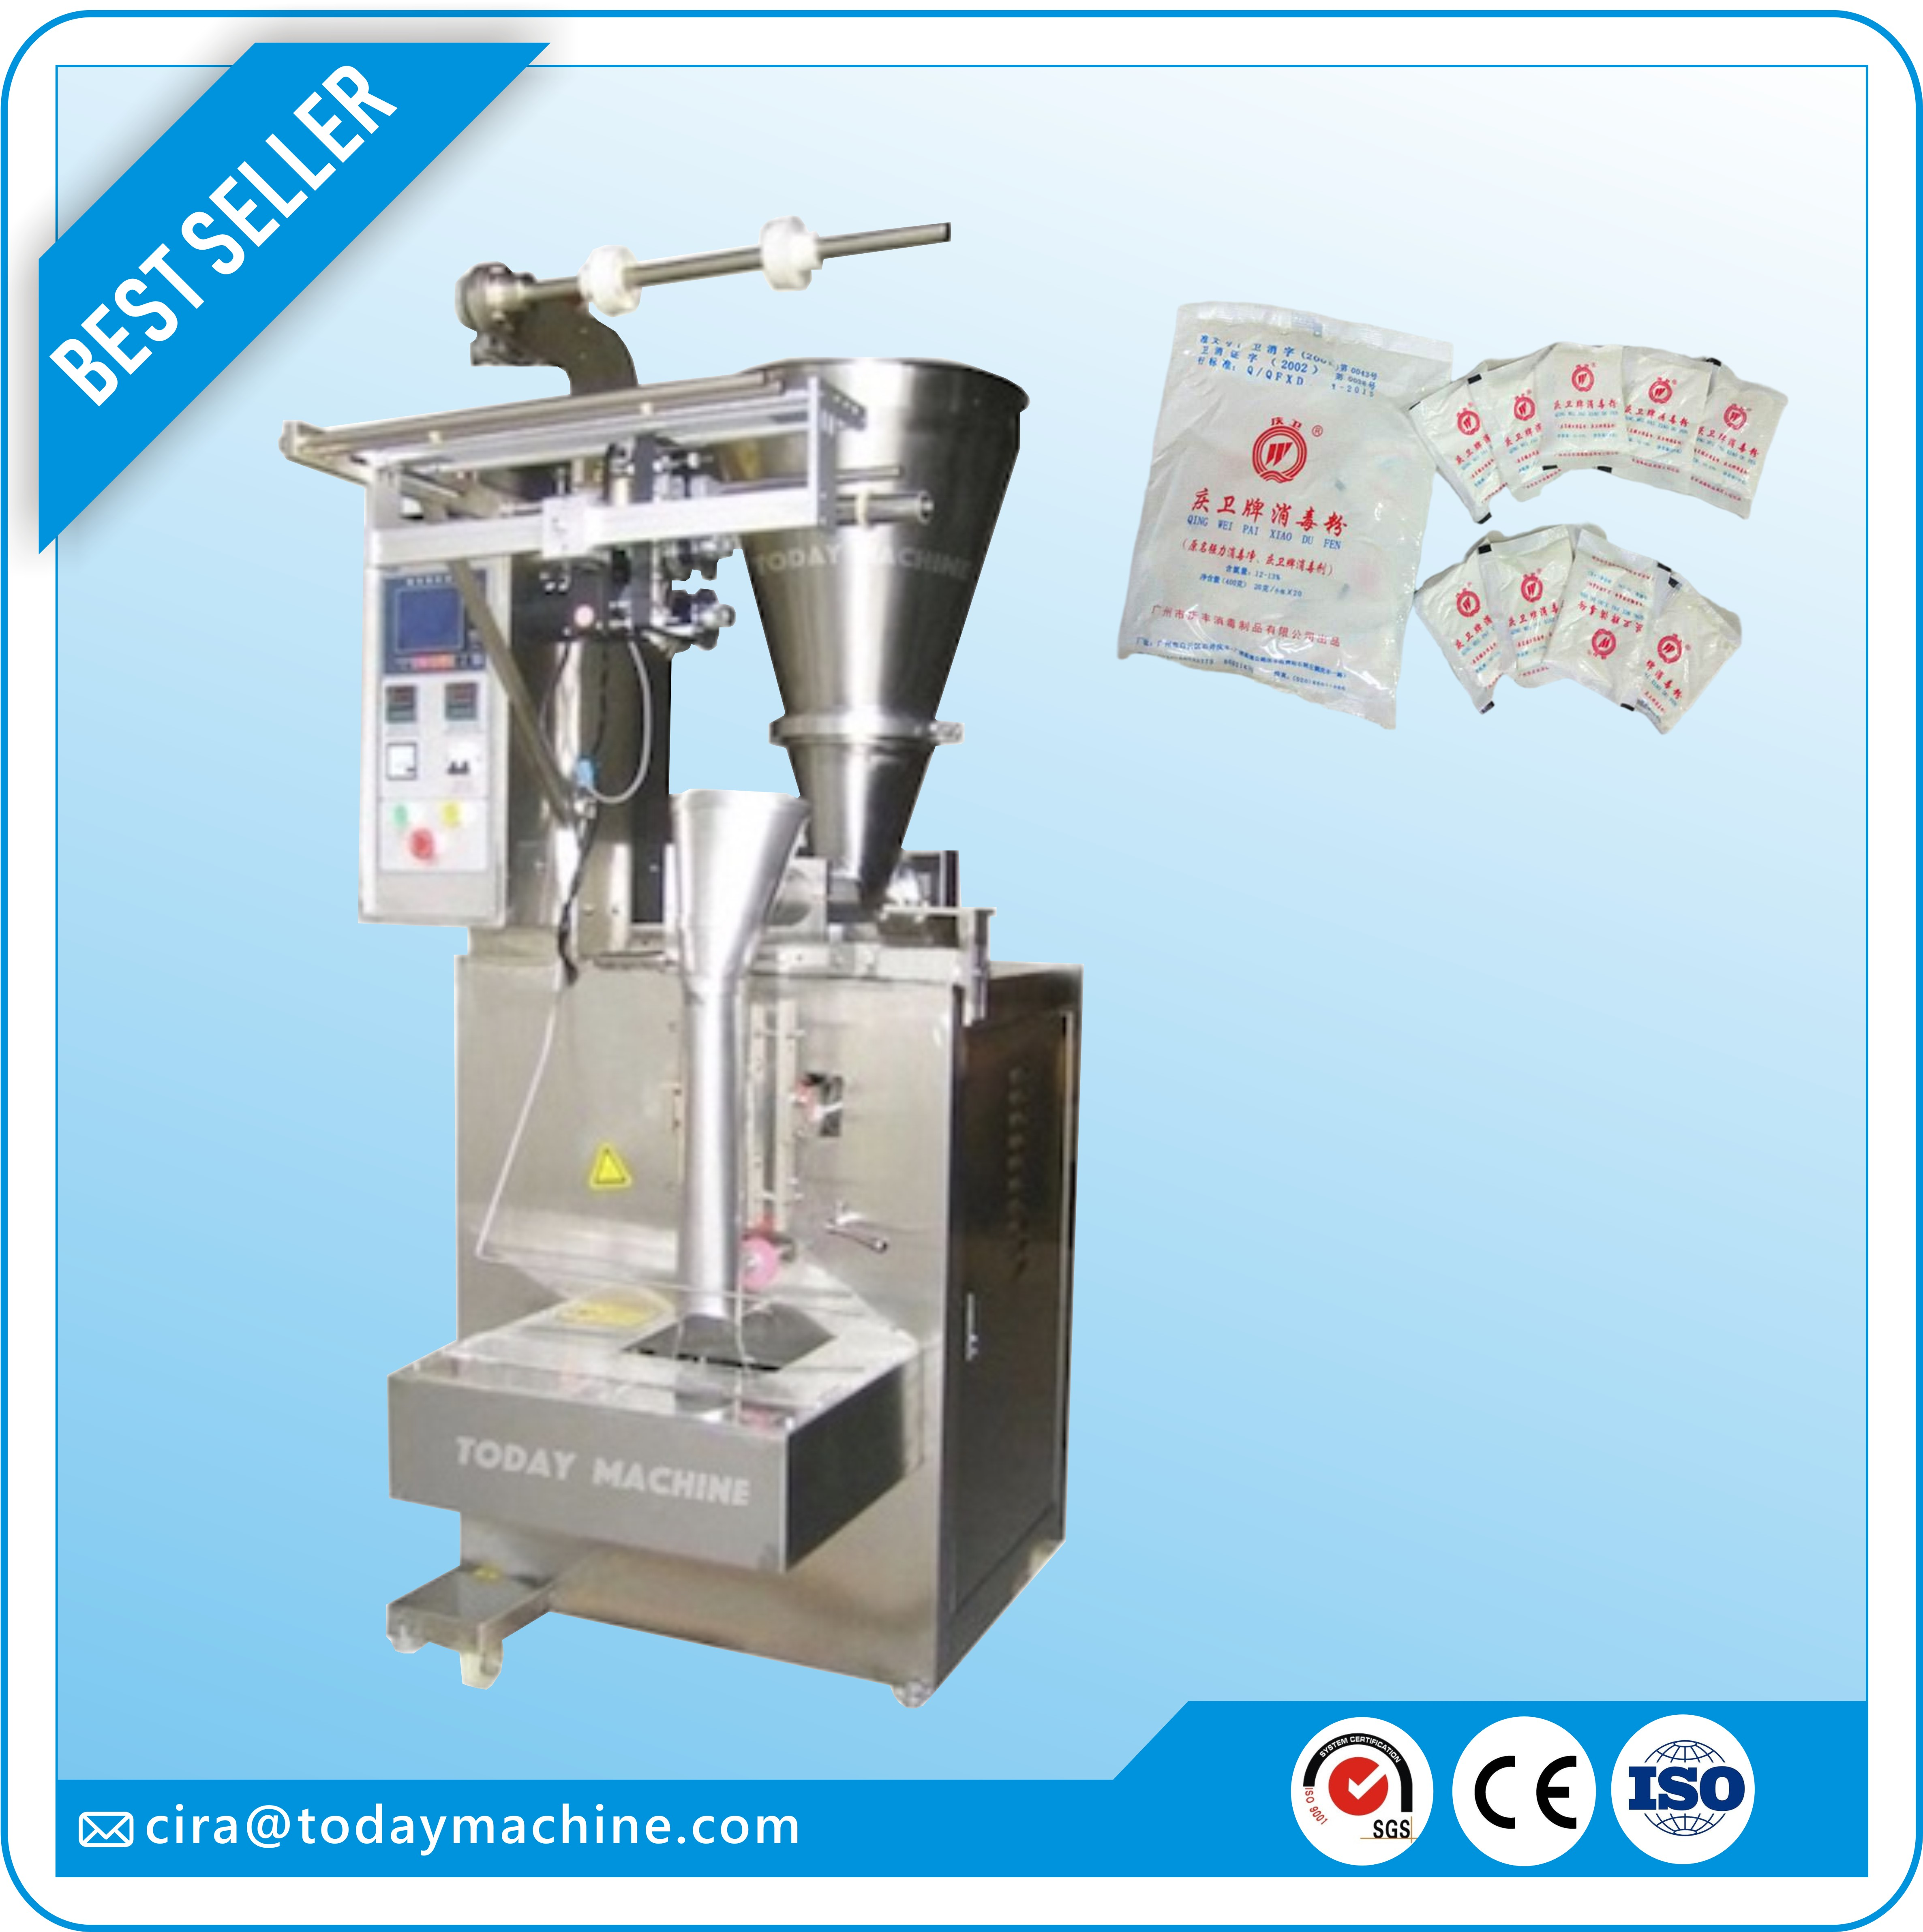 Comment Savoir Si Induction cbd commercial automatic 10g small pouch sachet chili